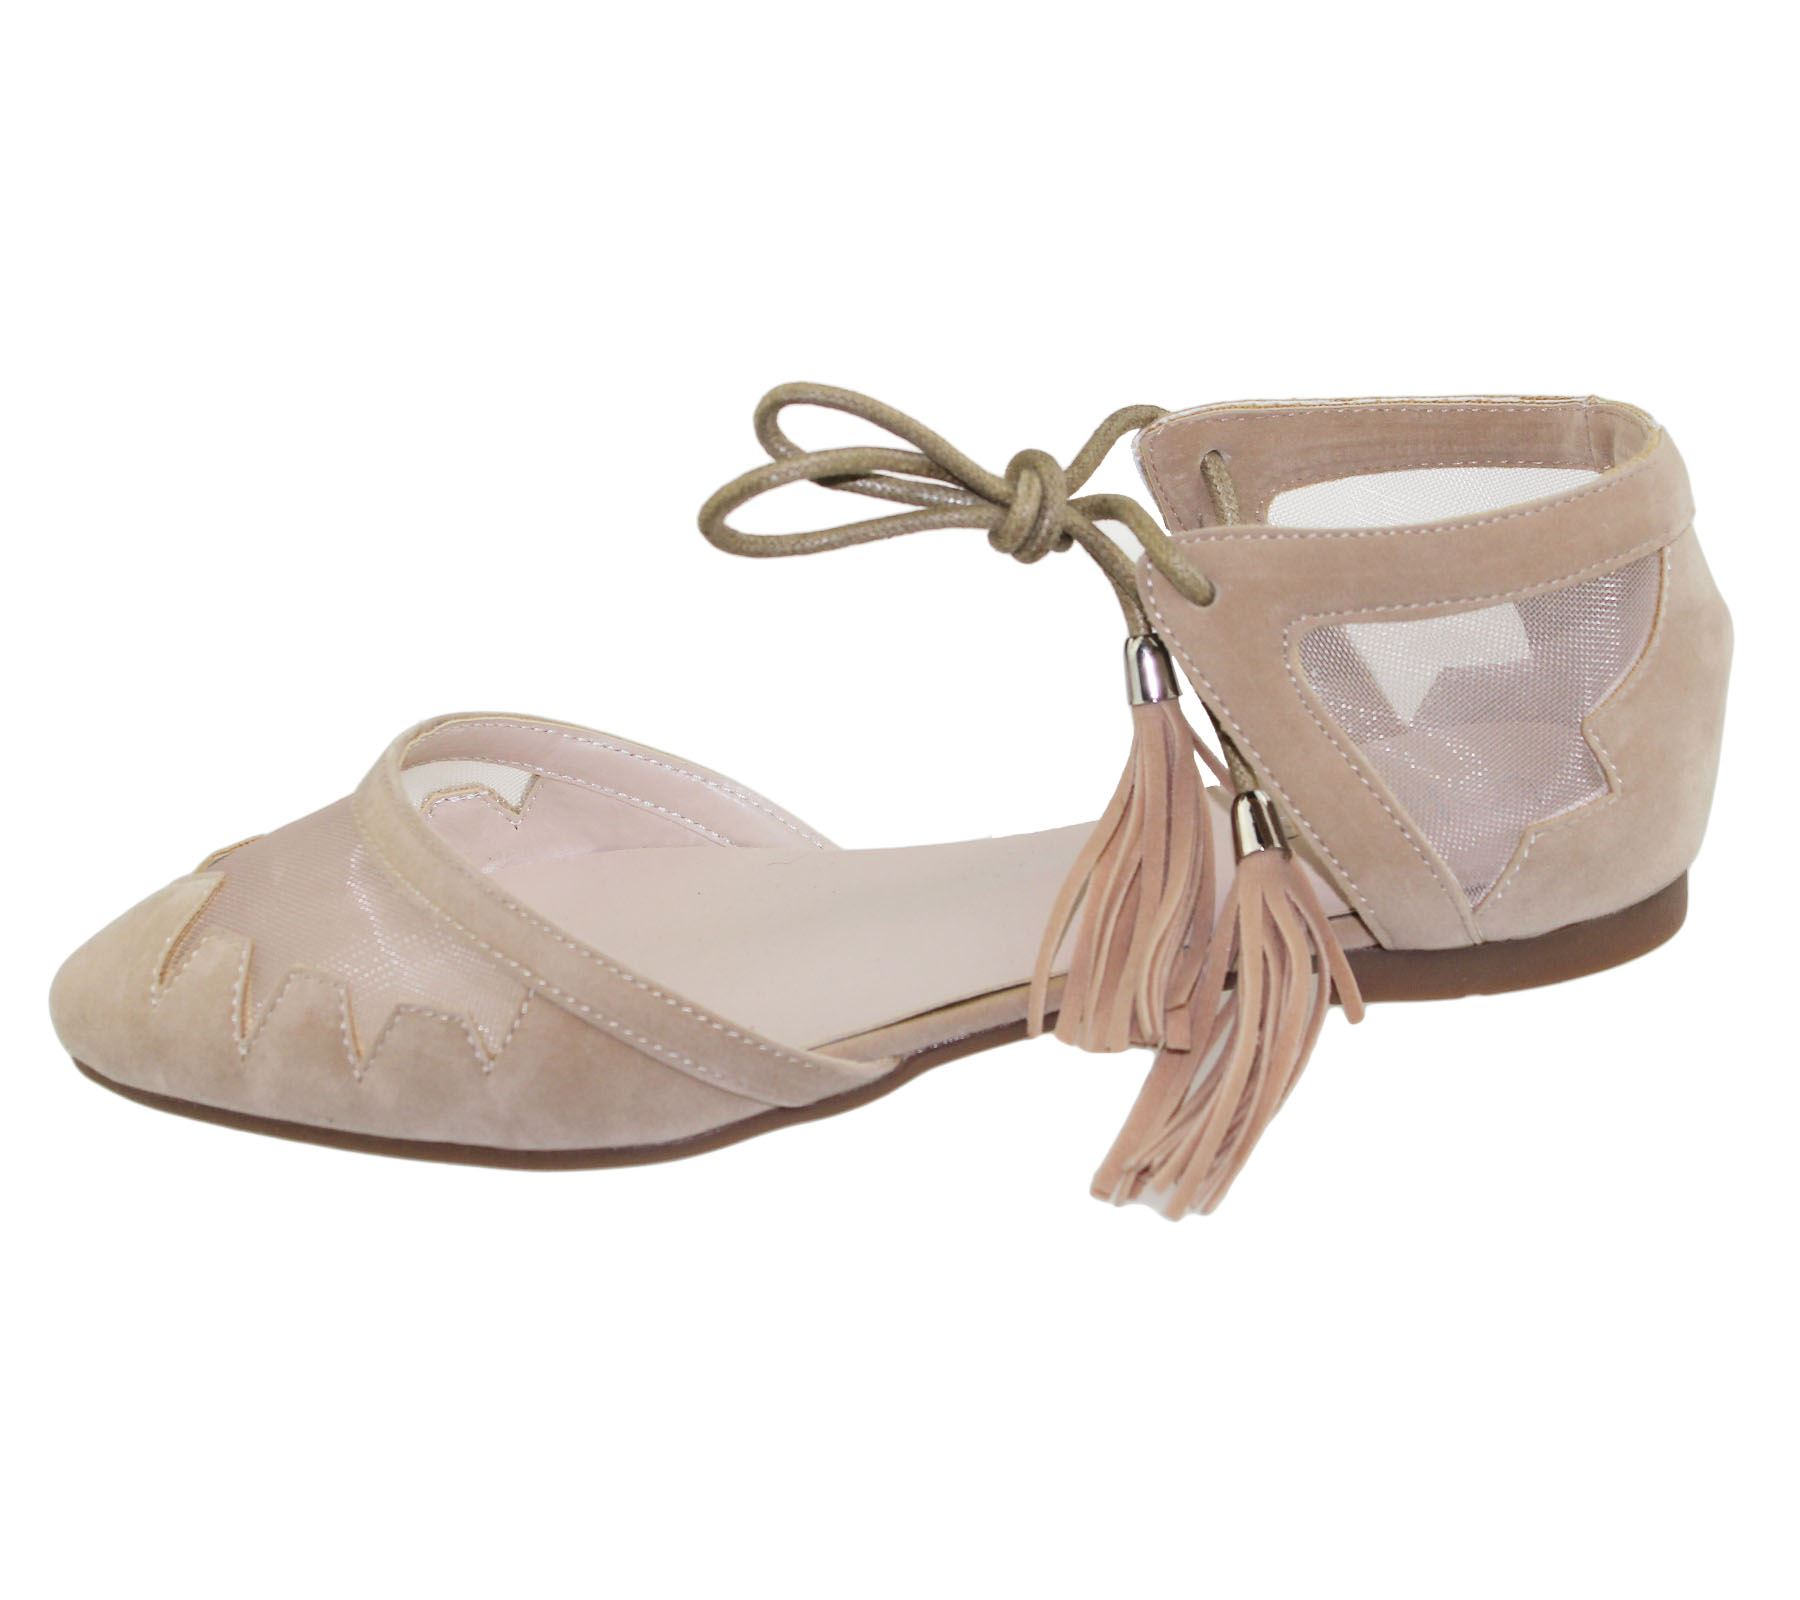 Womens-Flat-Ballerina-Dolly-Pumps-Ballet-Ladies-Summer-Mesh-Tassel-Shoes-Sandals thumbnail 13